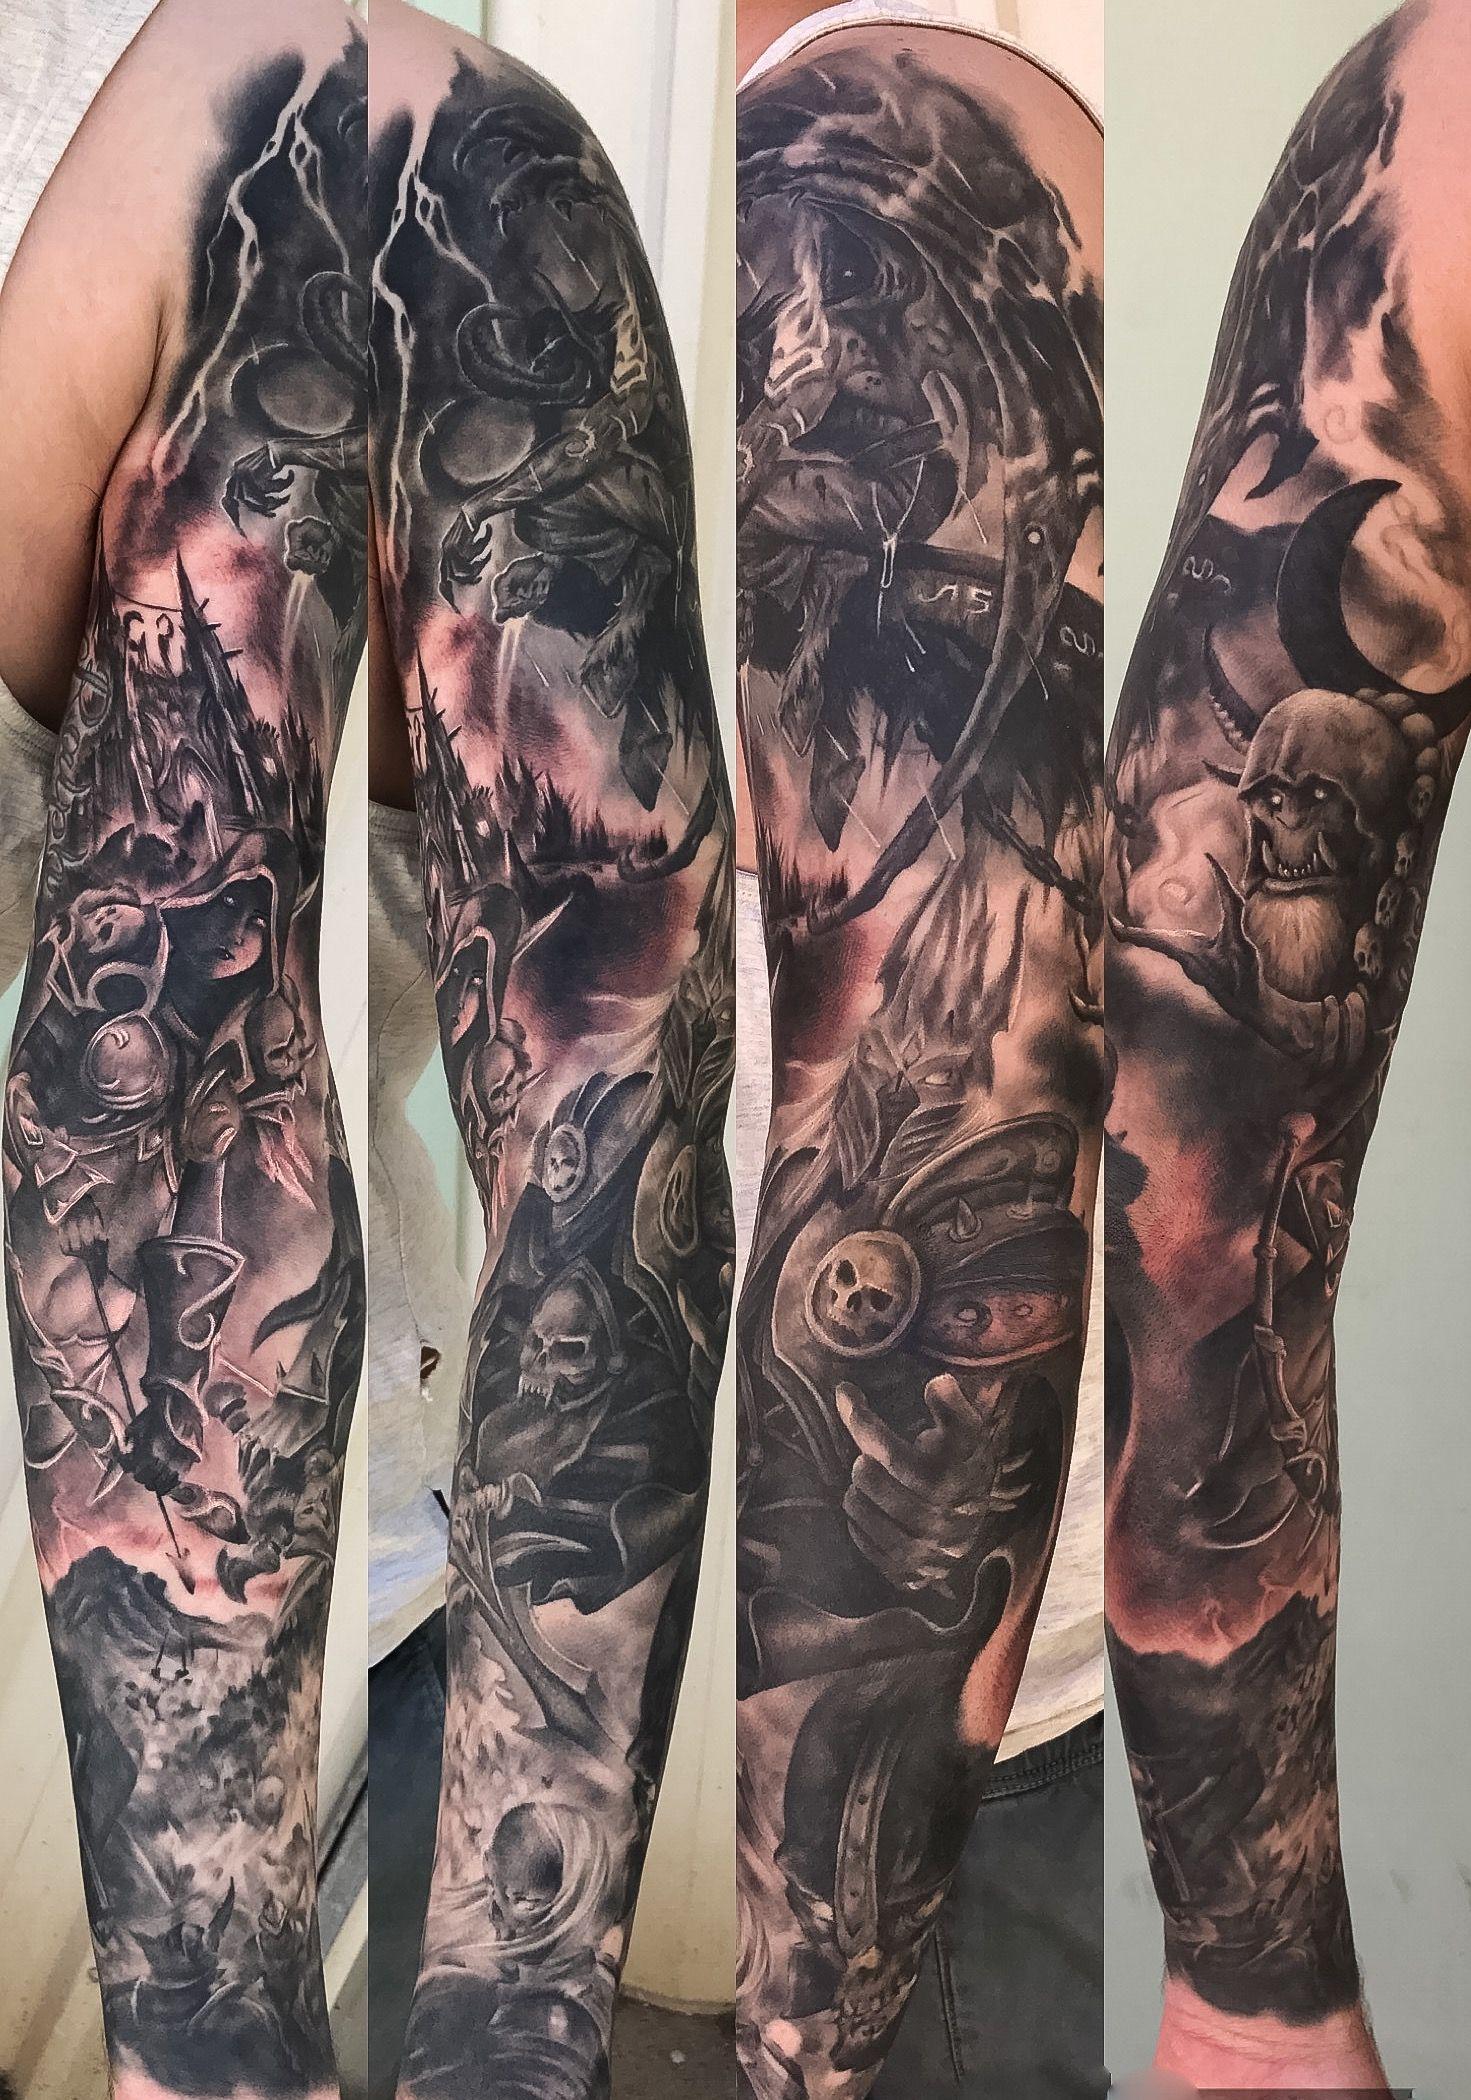 World Of Warcraft Tattoos By Samantha Sharland Tattoos Aquarius